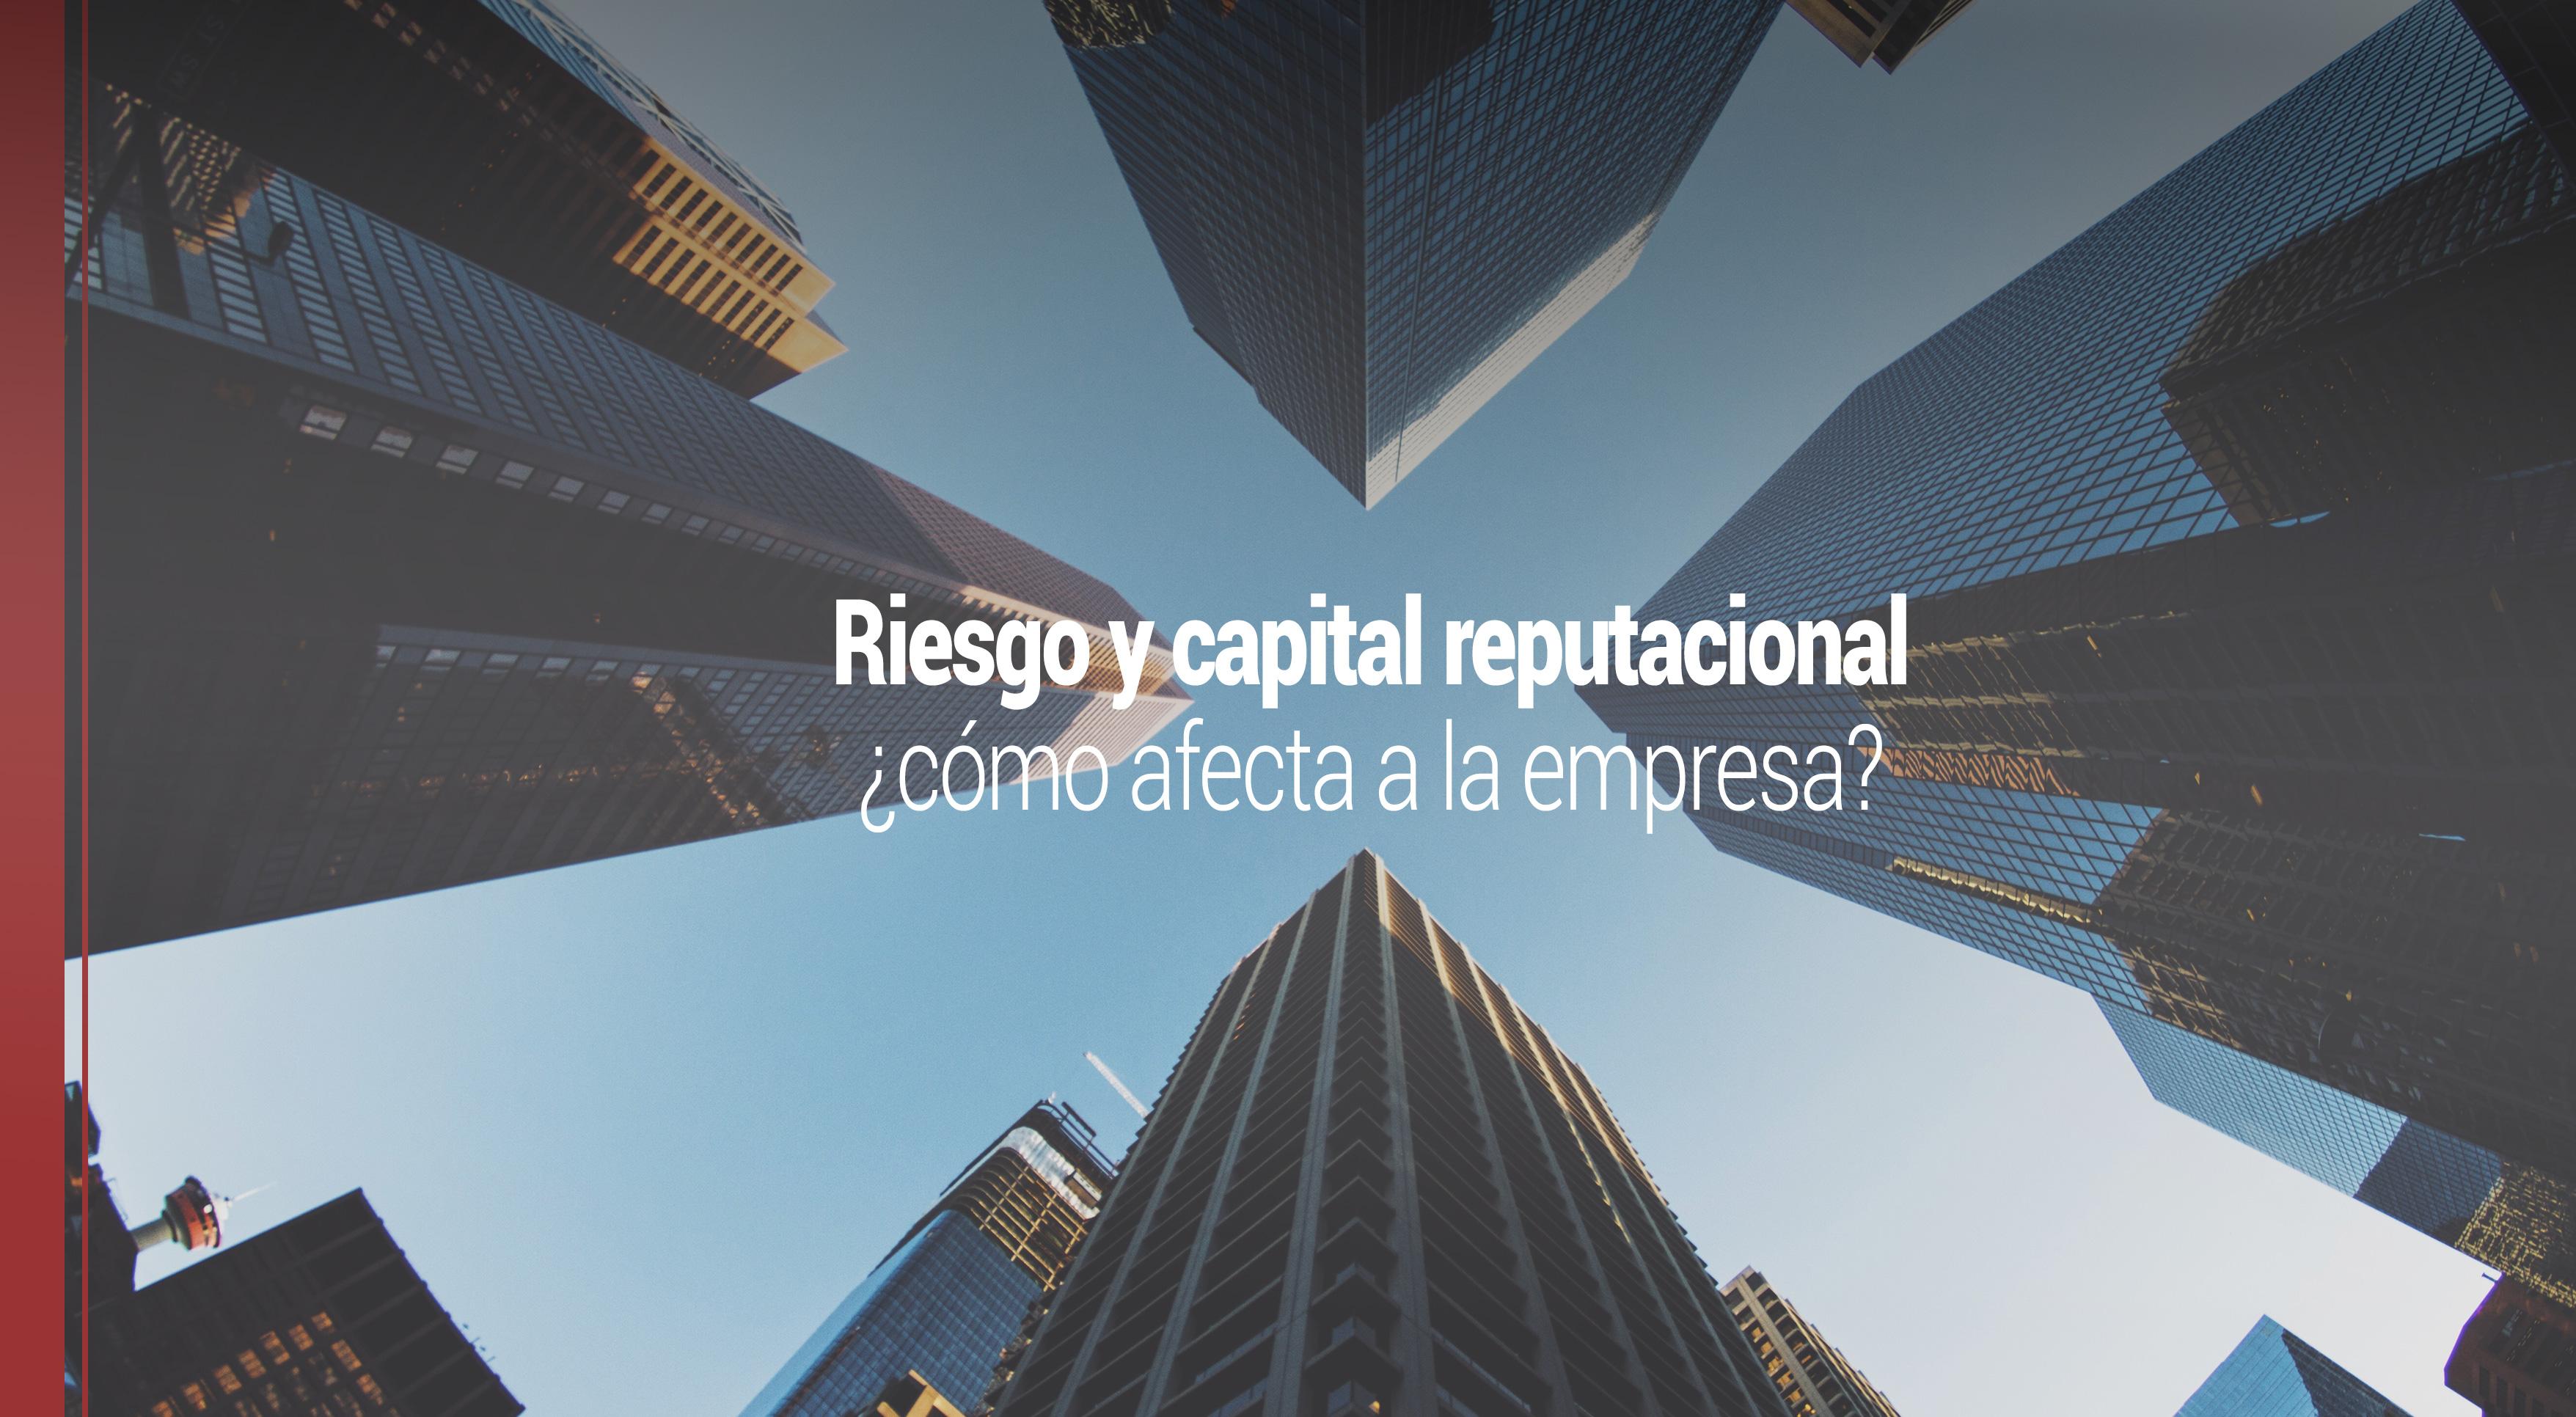 riesgo-capital-reputacional-empresa Riesgo y capital reputacional: cómo afectan a una empresa